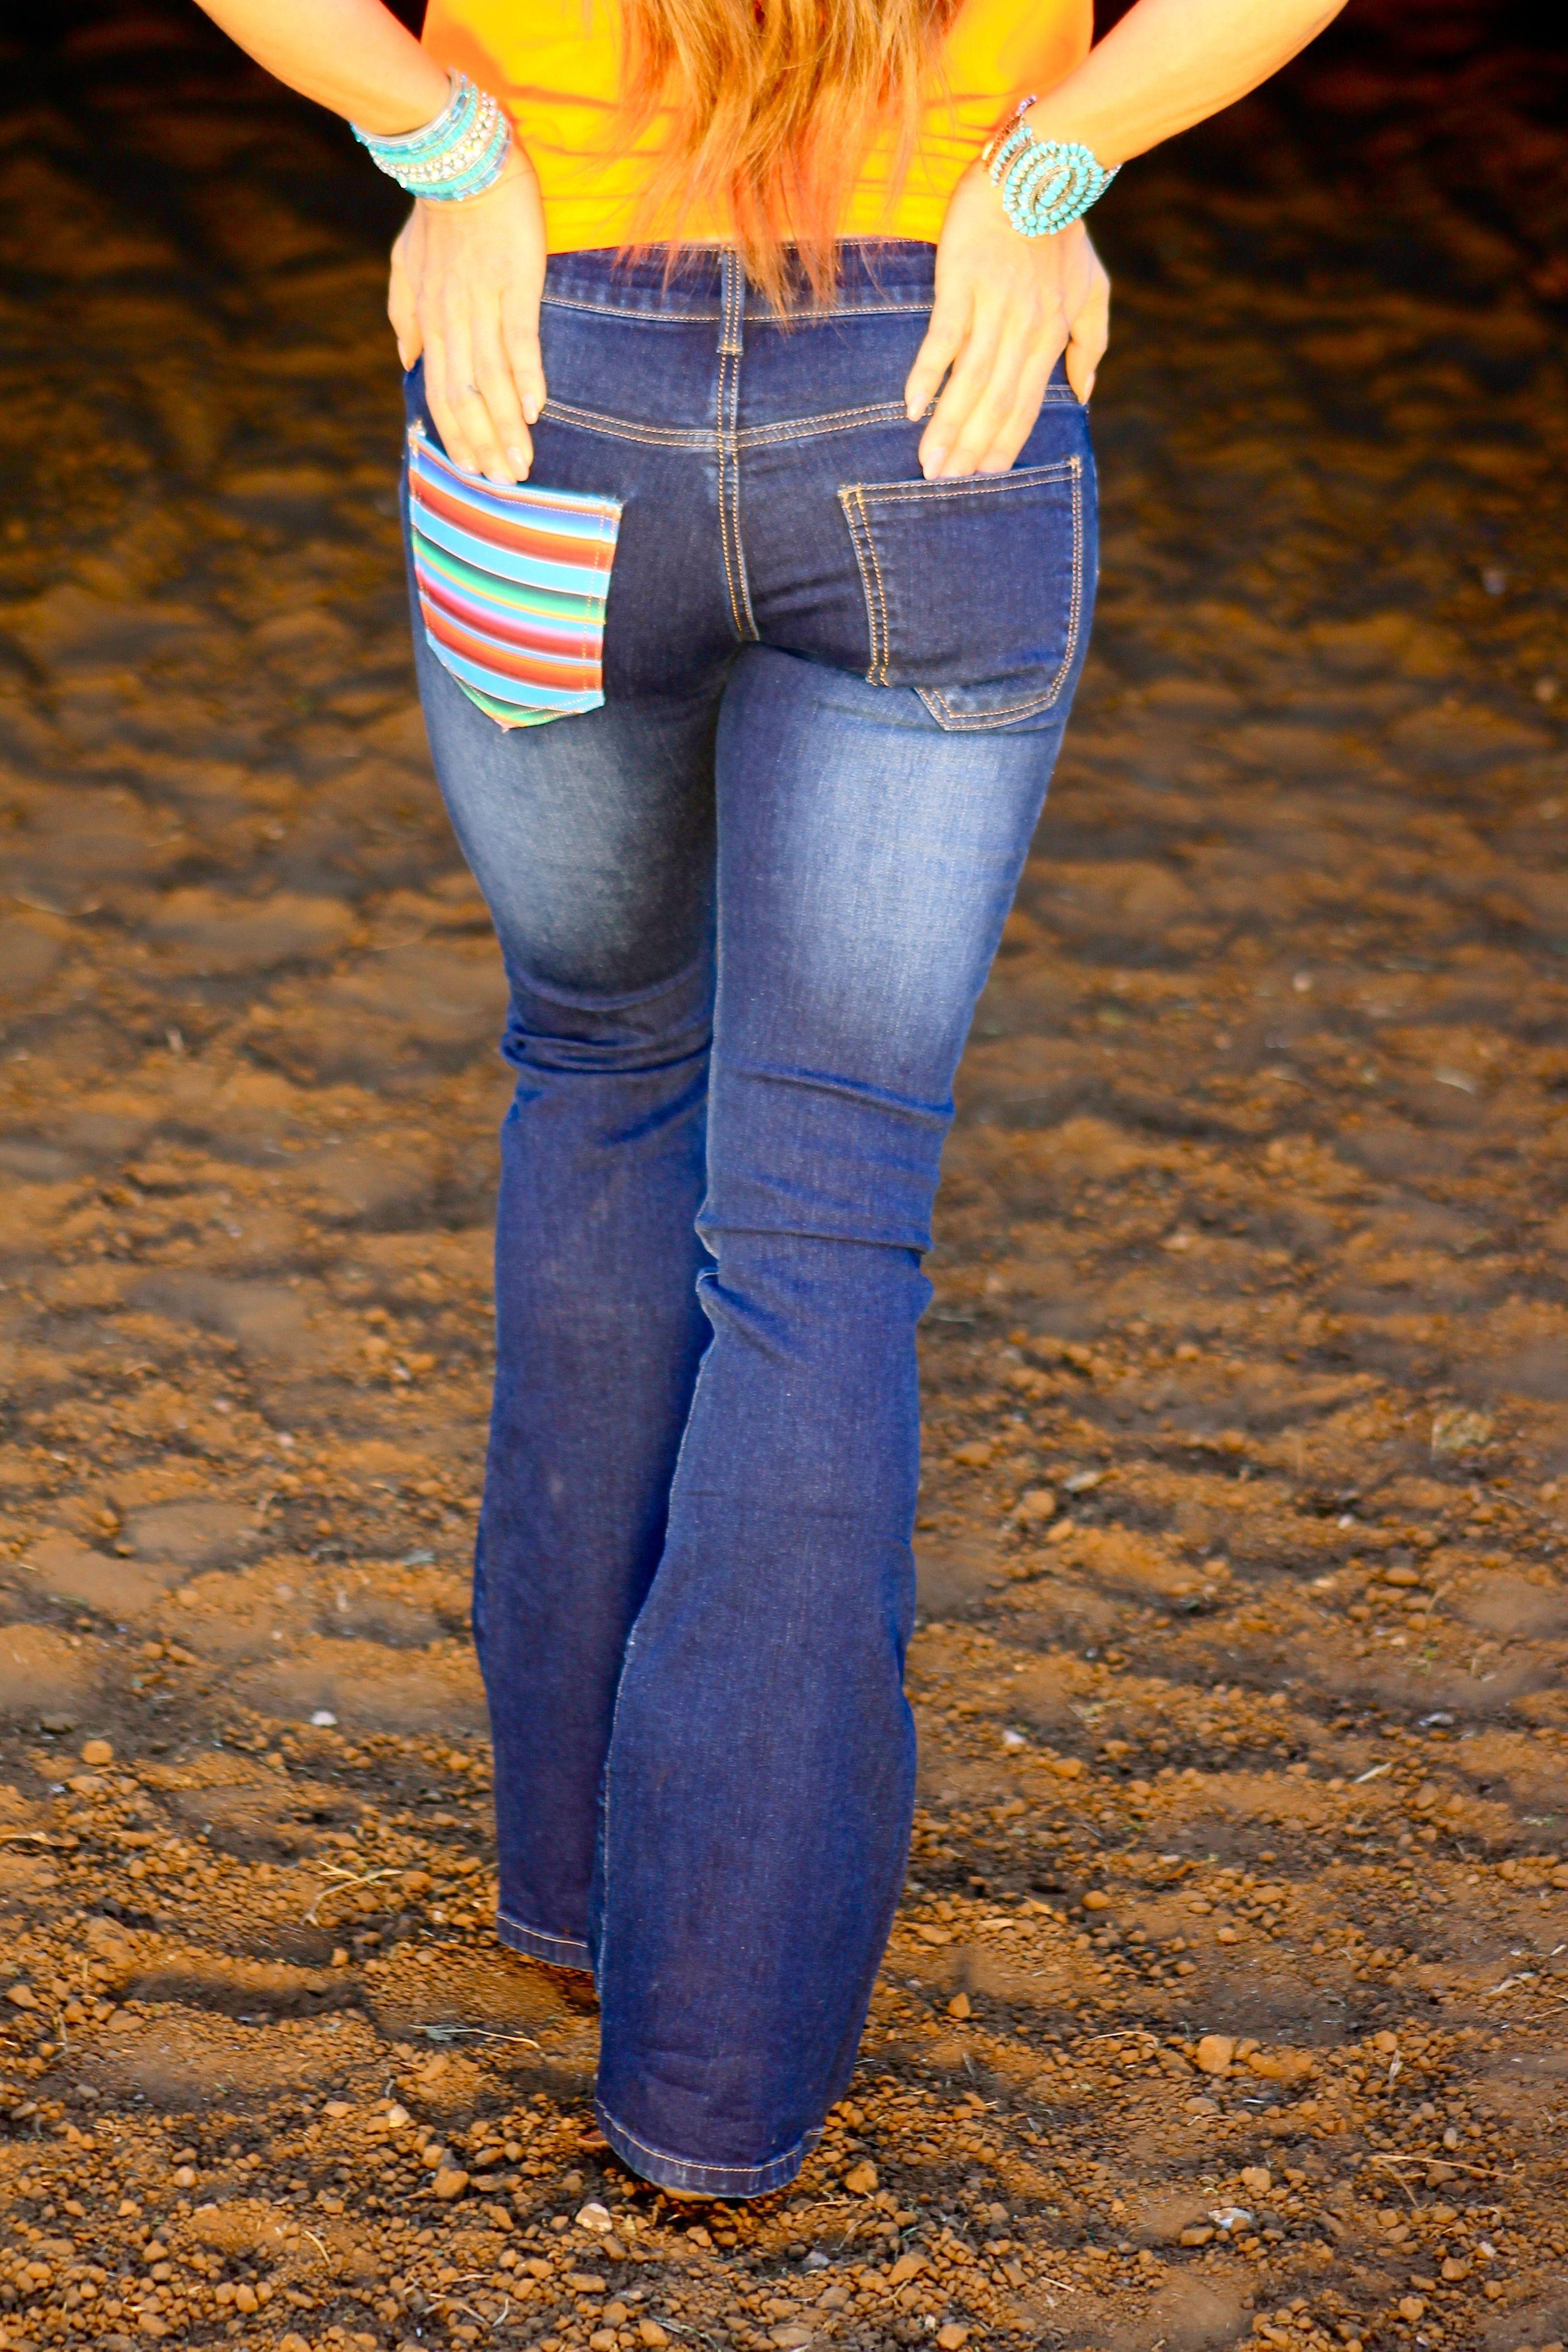 Serape jeans ranch dress 39 n ranch dress 39 n pinterest for Ranch dress n rodeo shirts